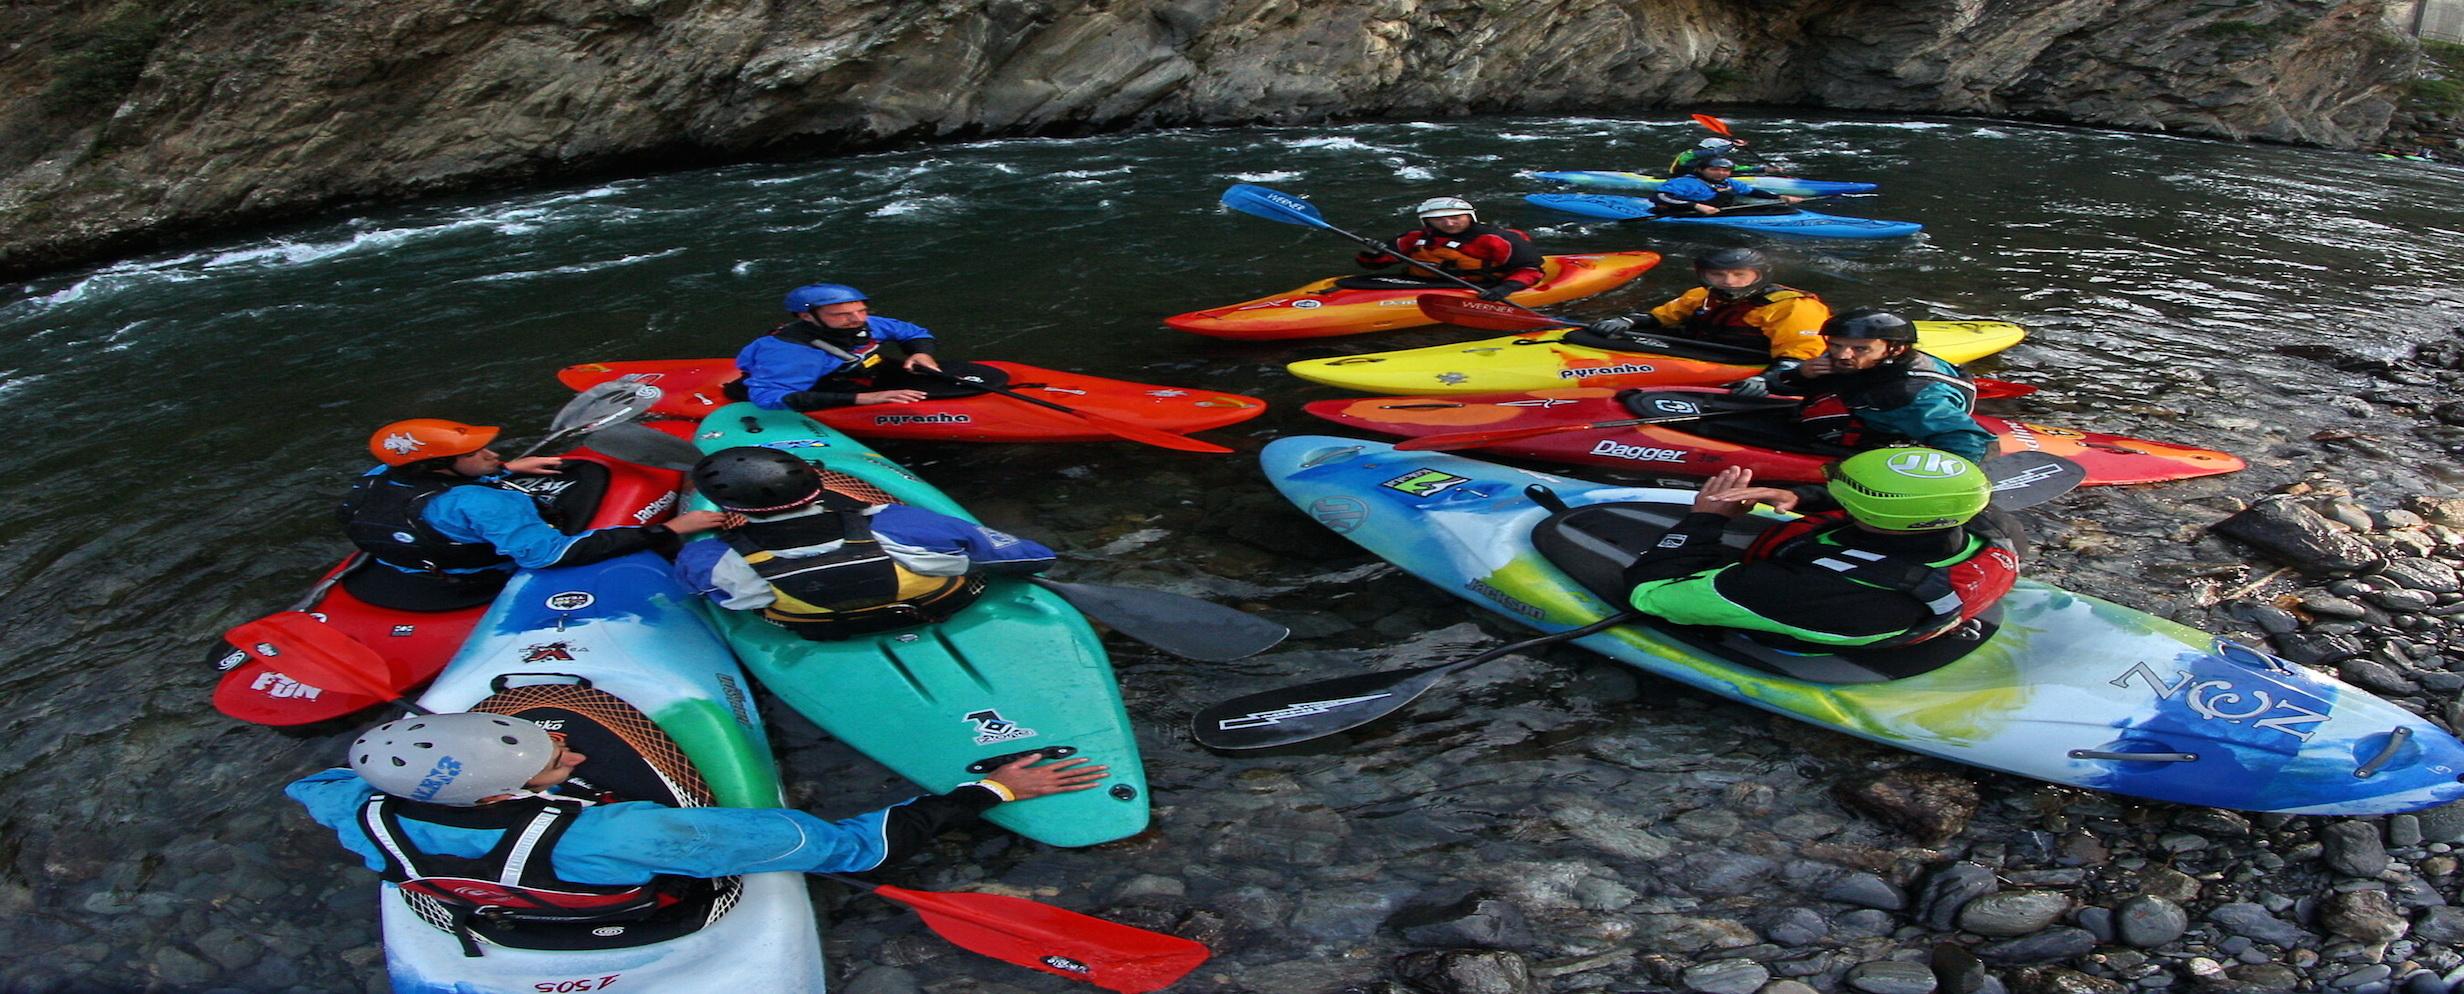 Noguera Pallaresa River Festival